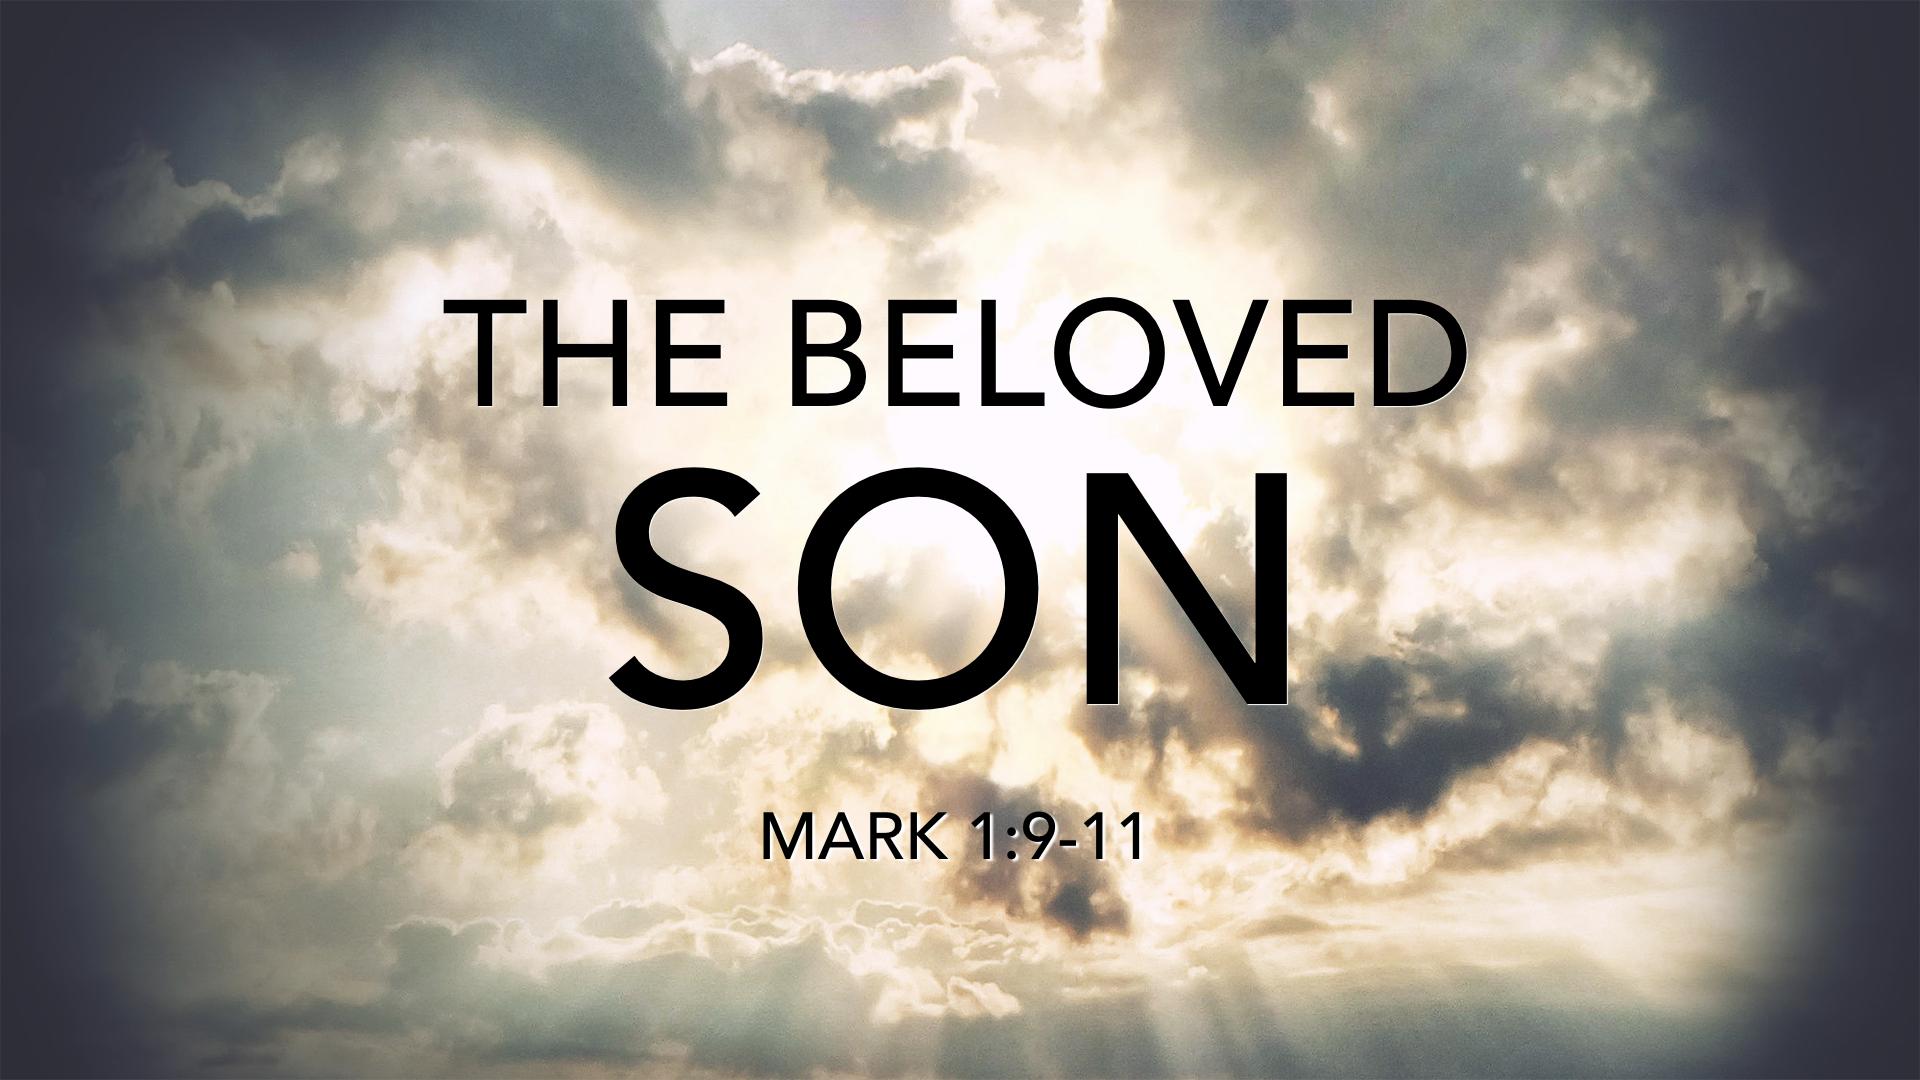 Mark 1 1 >> Mark 1 9 11 The Beloved Son West Palm Beach Church Of Christ